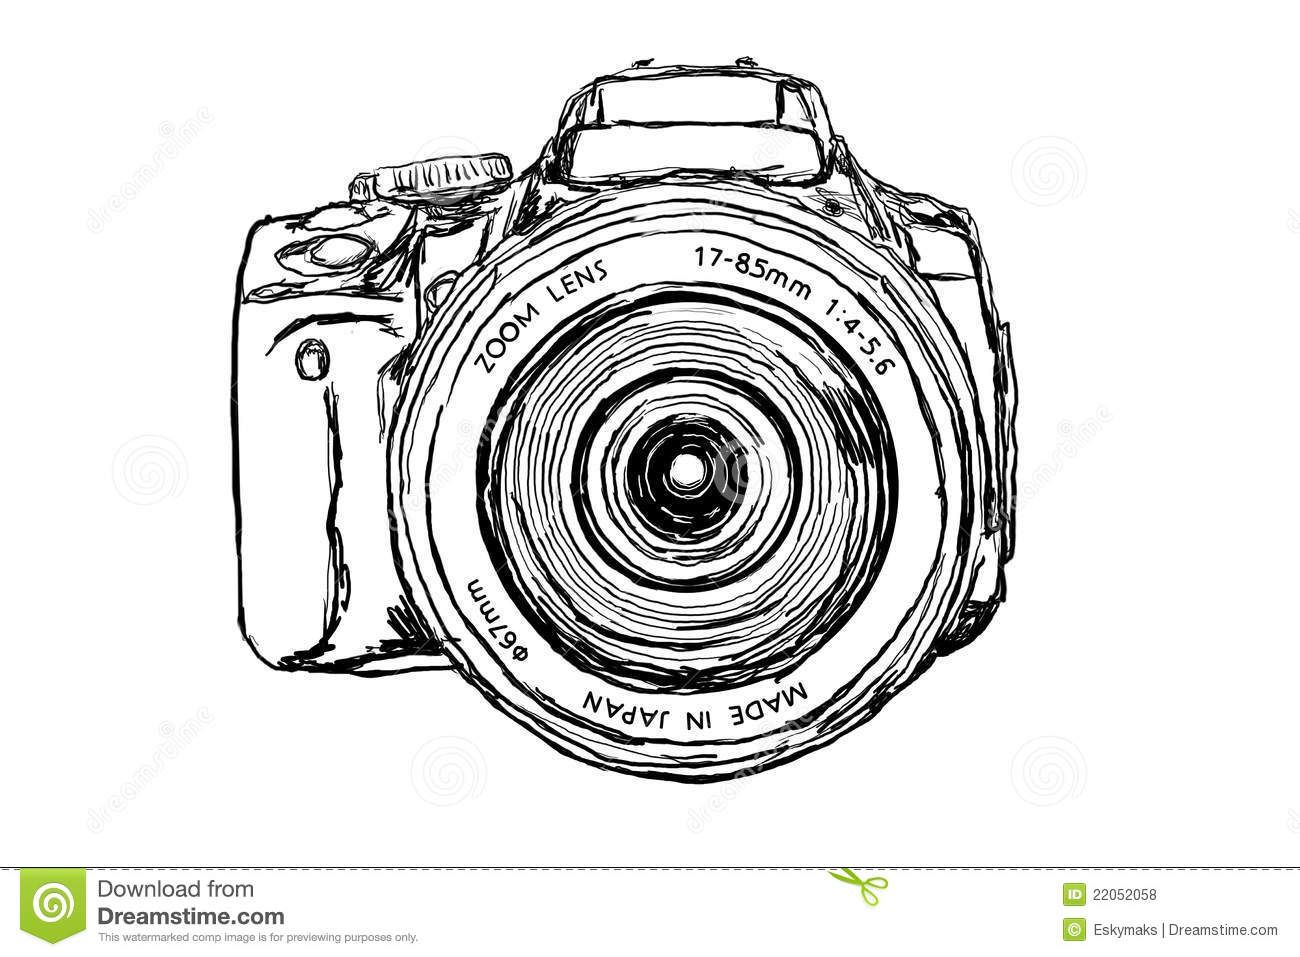 Digital Single Lens Reflex Camera on white background